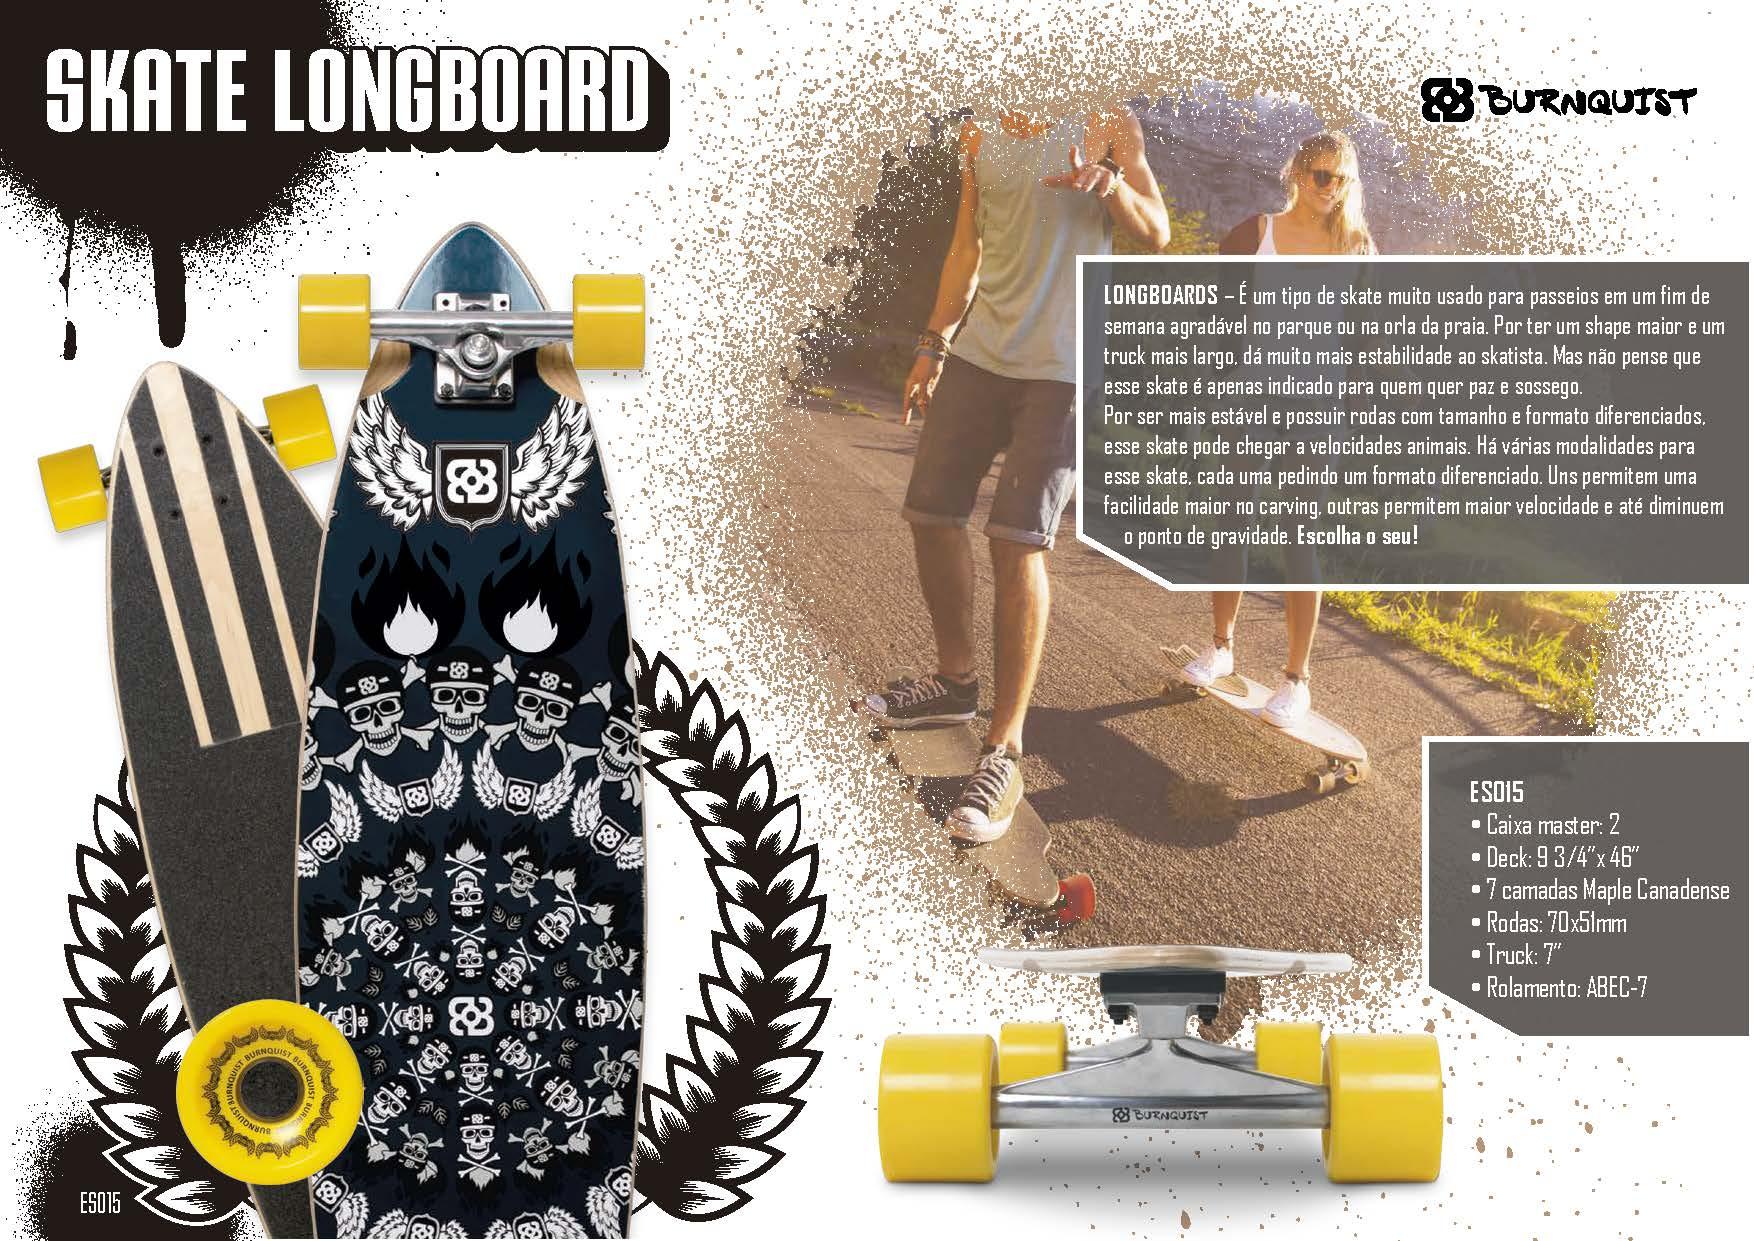 bc869e44e0367 Skate Bob Burnquist longboard Multilaser ES015